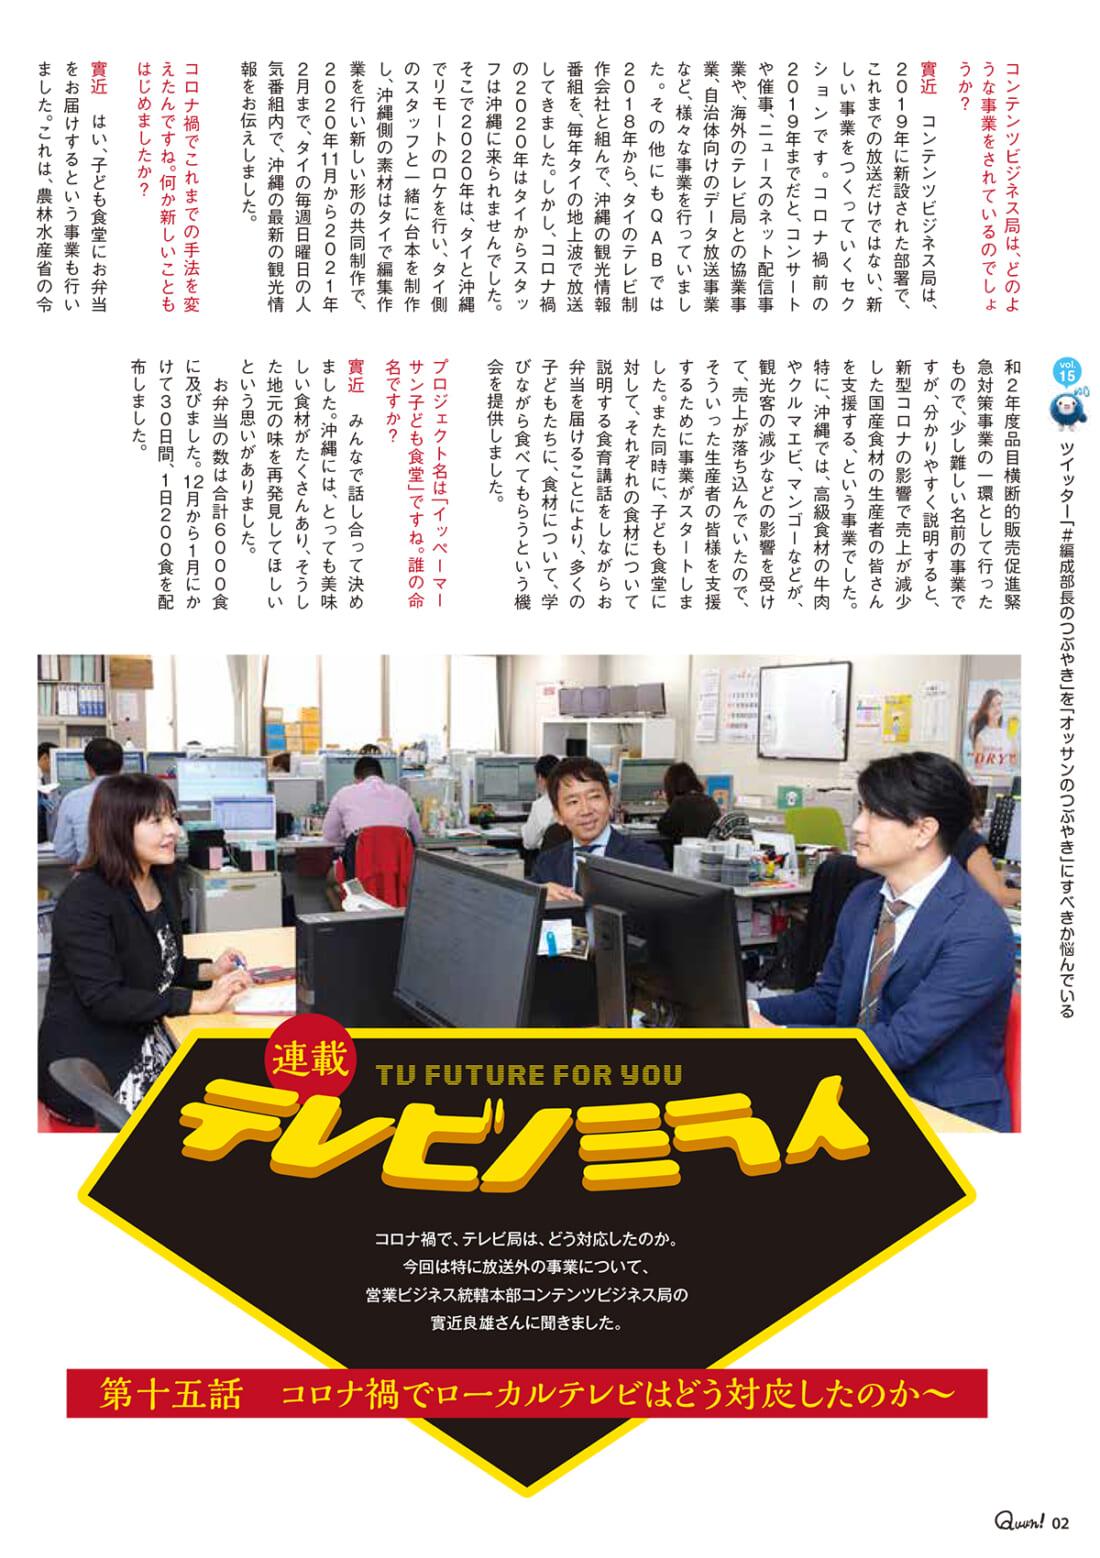 https://www.qab.co.jp/qgoro/wp-content/uploads/quun_1504-1100x1558.jpg